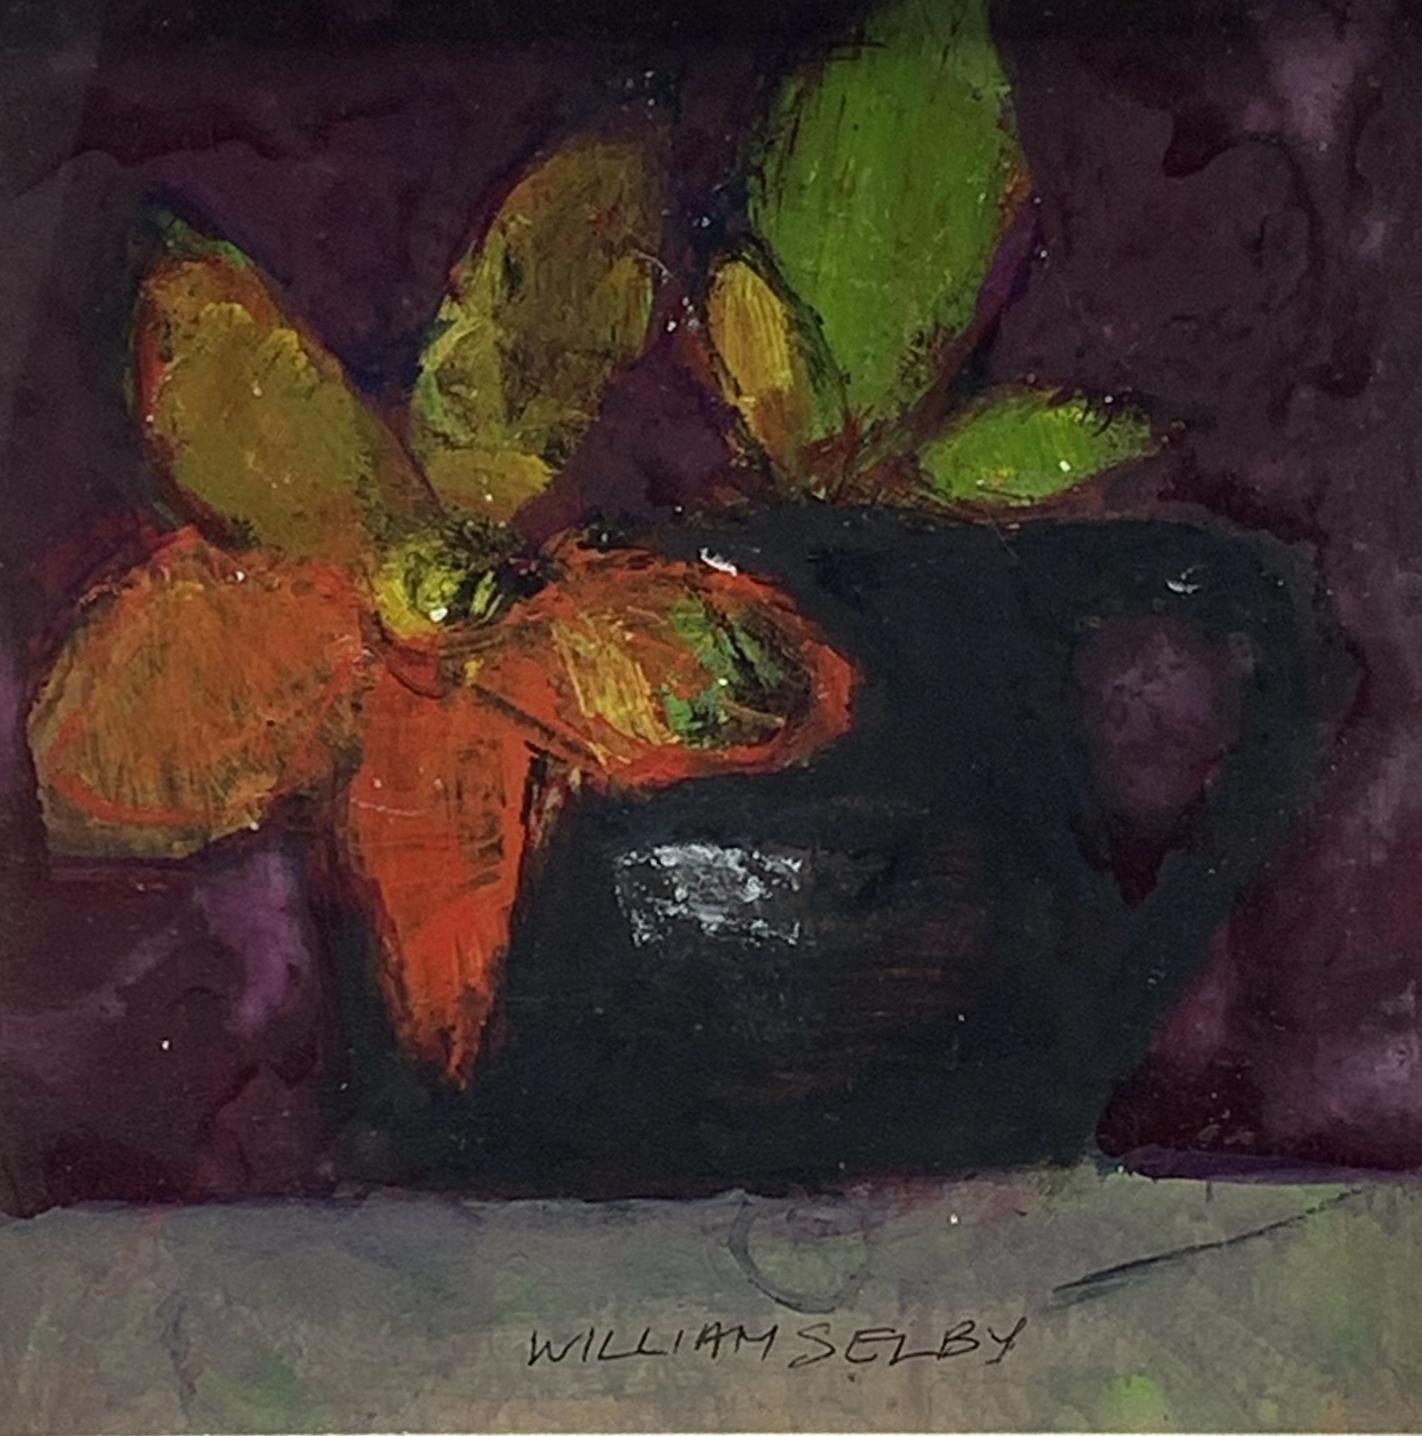 William Selby (British 1933-): Still Life with Black Mug, mixed media signed 18cm x 18cm, UK